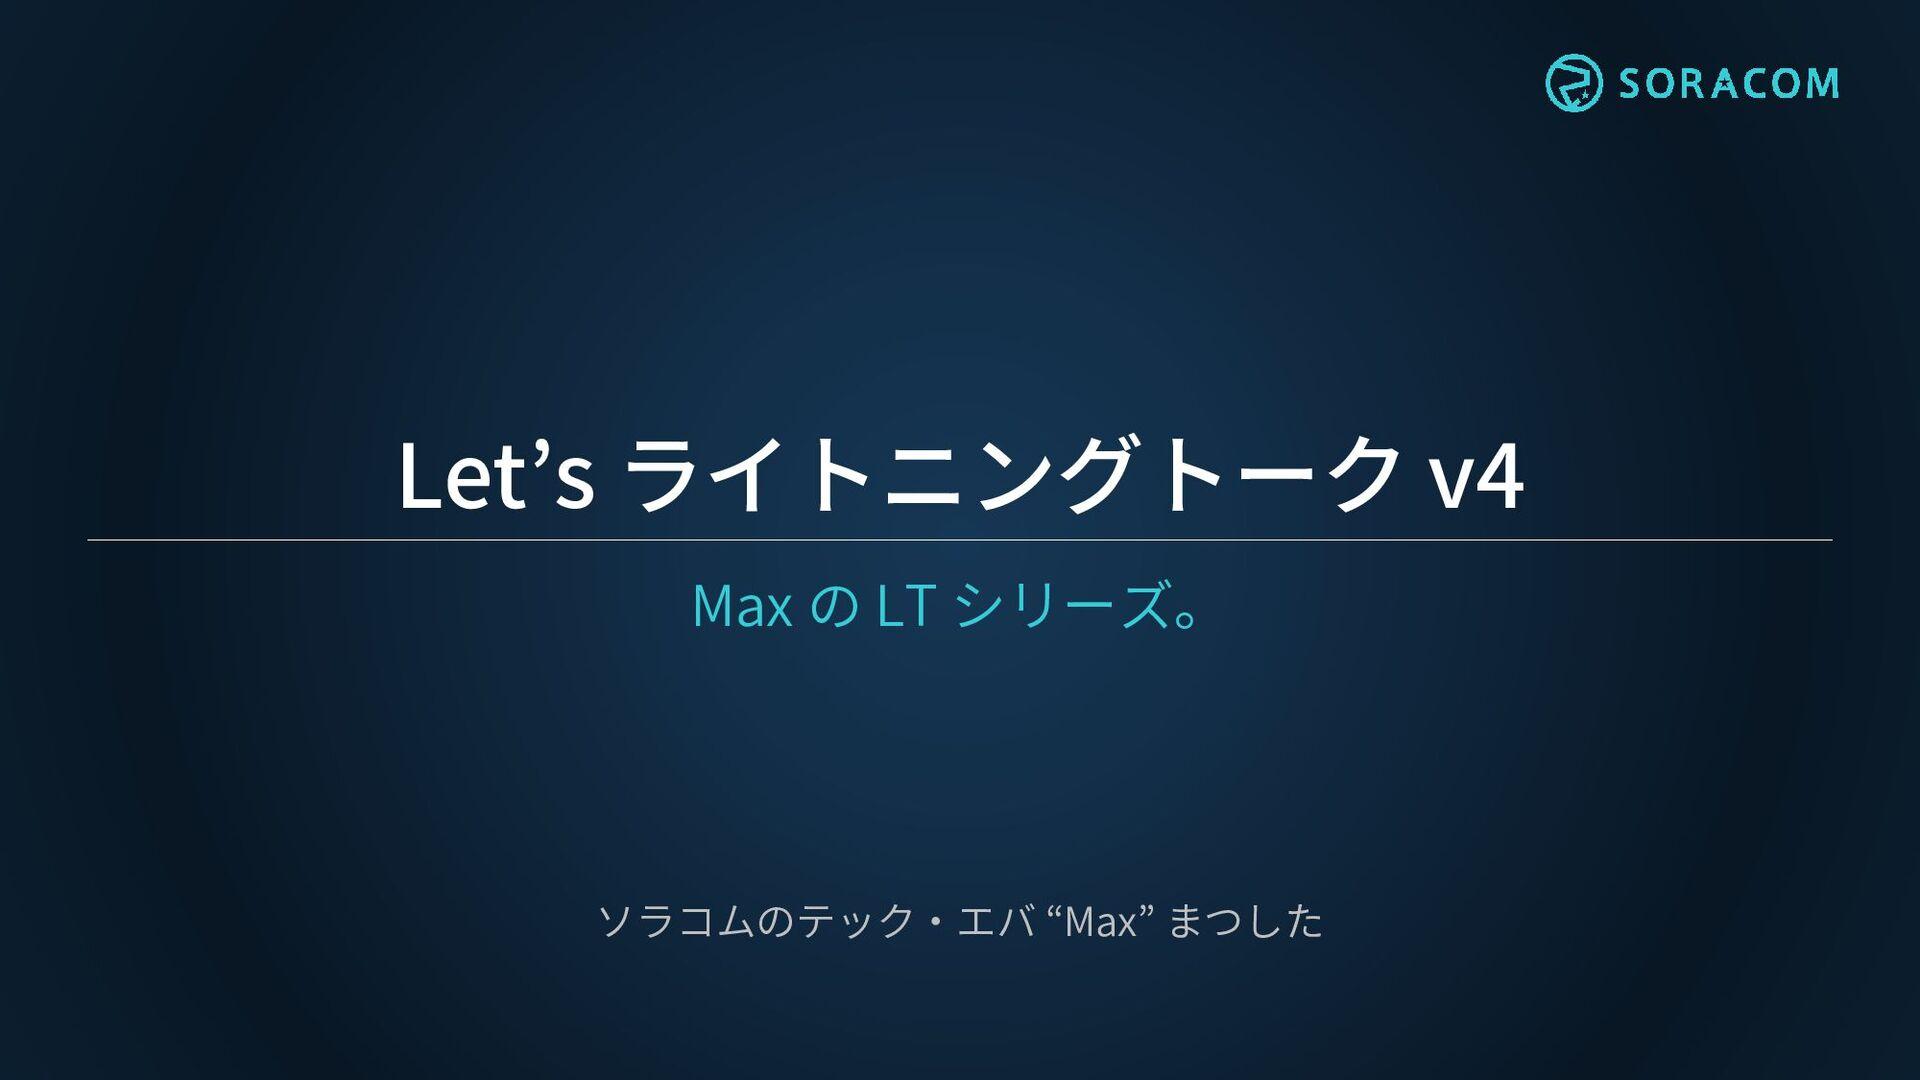 "Let's ライトニングトーク v3 Max の LT シリーズ。 ソラコムのテック・エバ ""..."